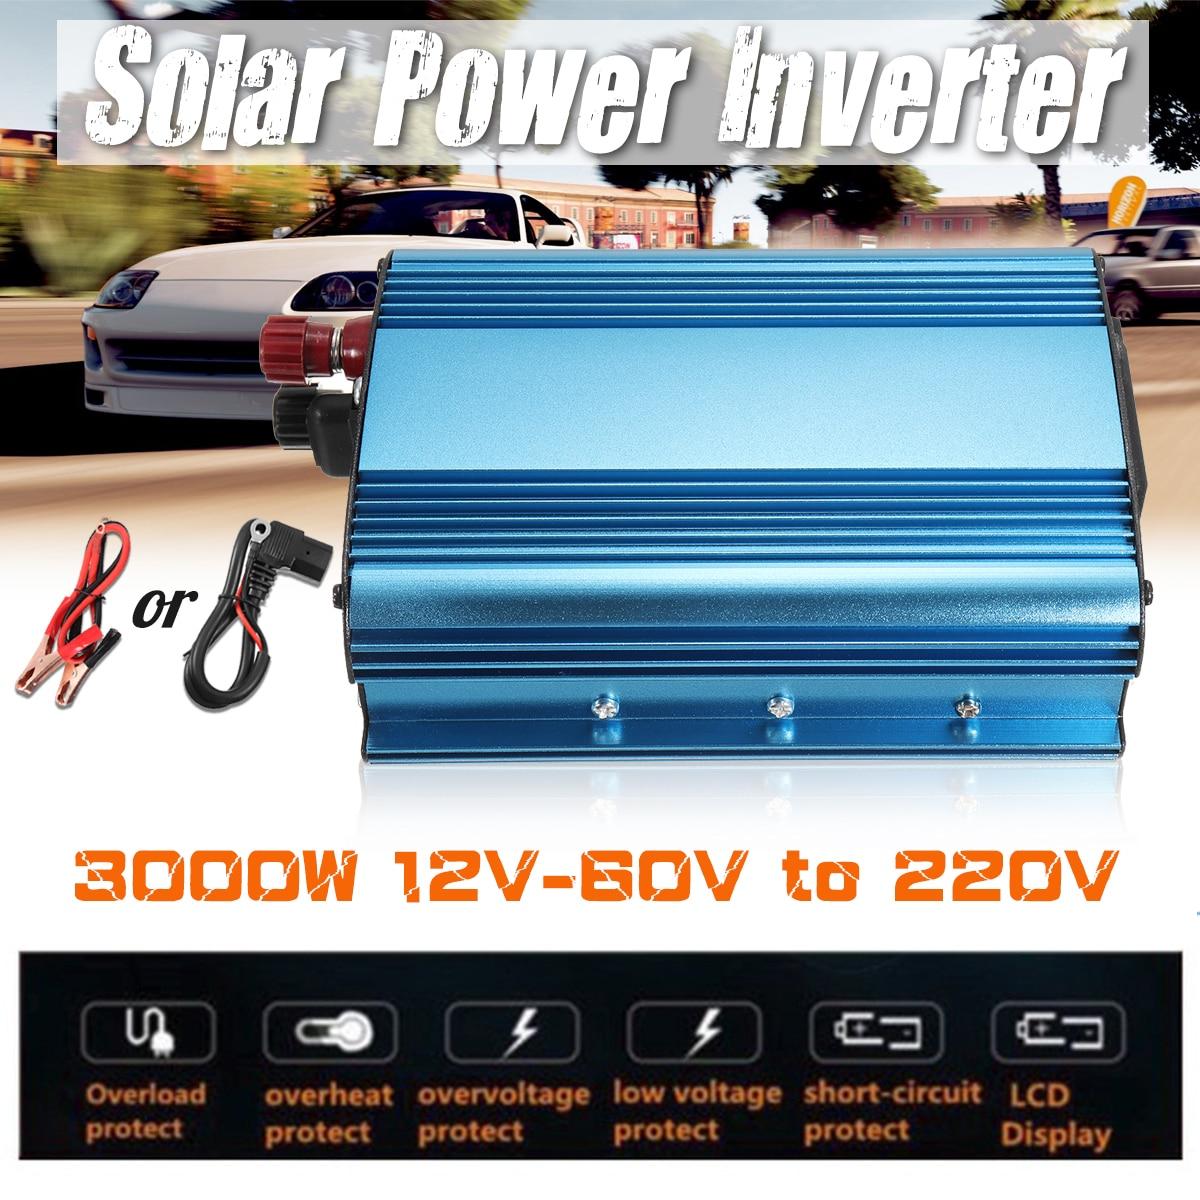 цена на 3000W Solar Power Inverter 12V/24V/48V/60V To 220V DC-AC Car Inverter Sine Wave Solar Convertor Voltage Transformer